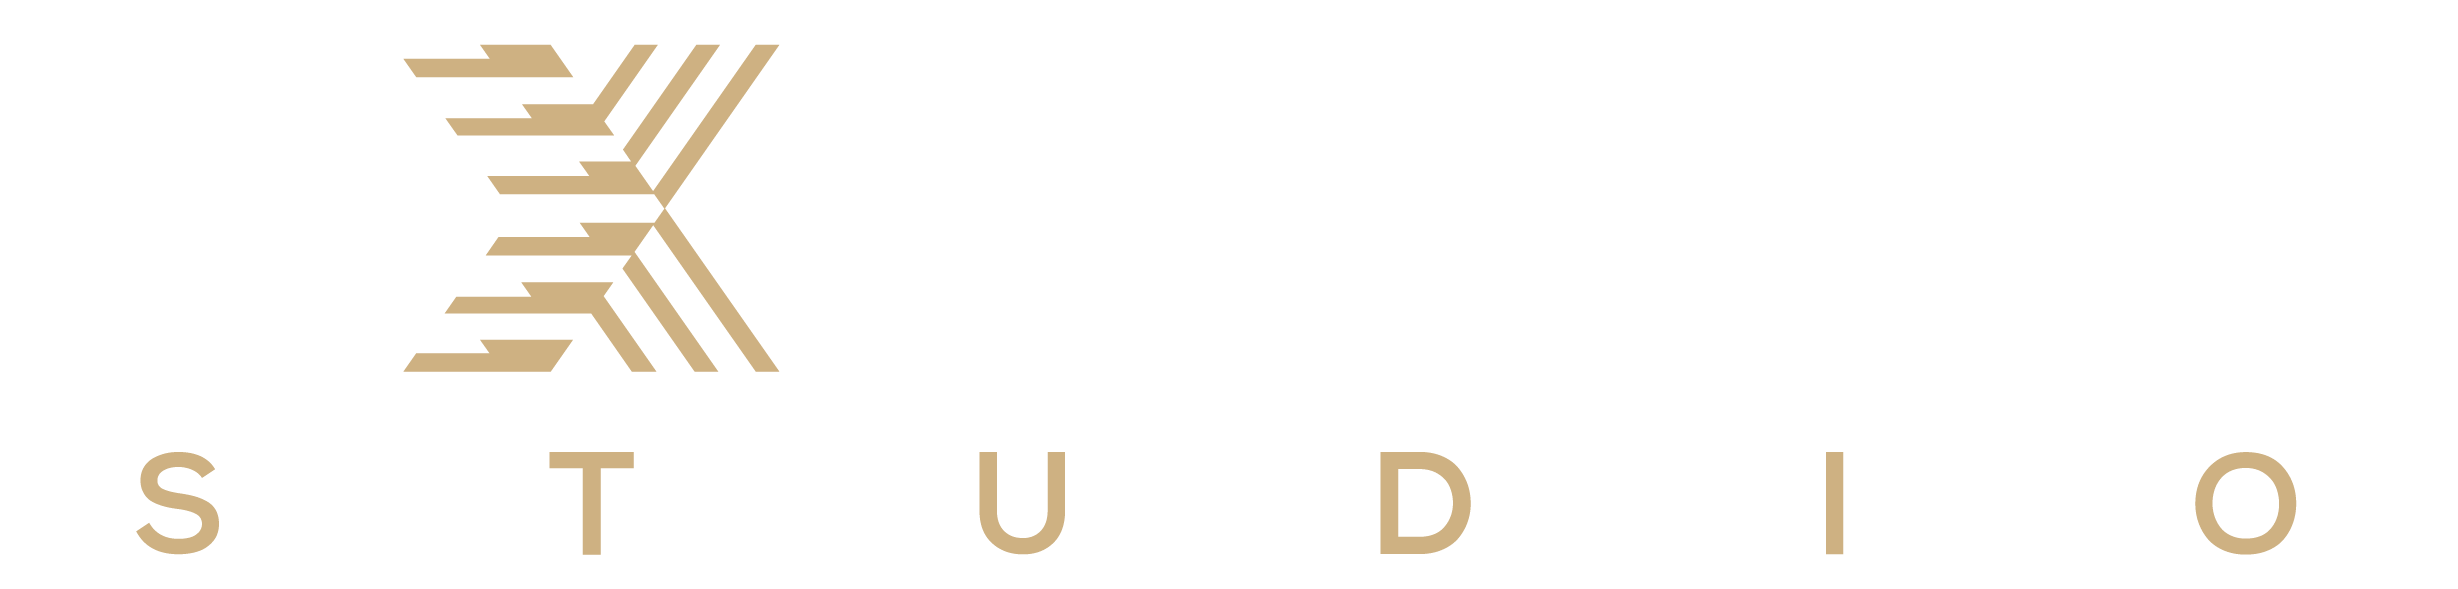 EXNOVA studio